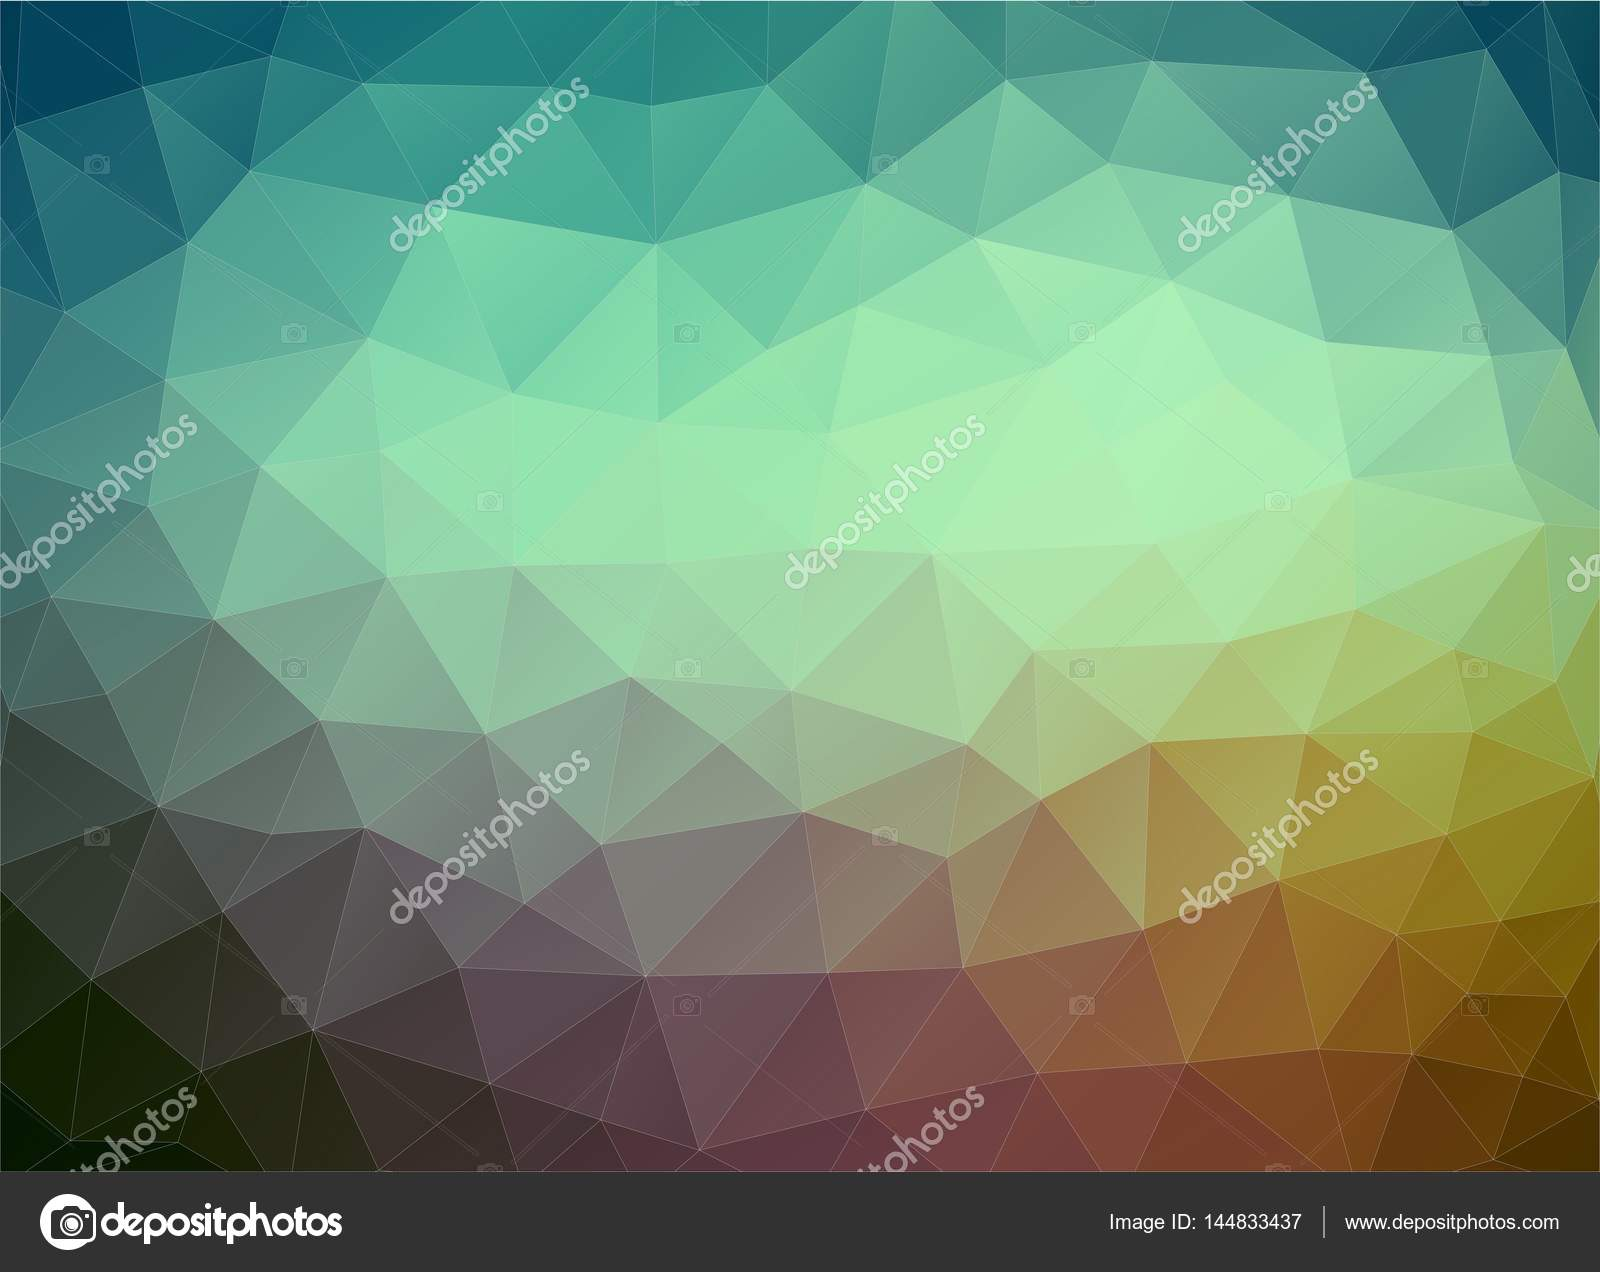 Flat Geometric Triangle Pattern Wallpaper Vector Background By Ishmel